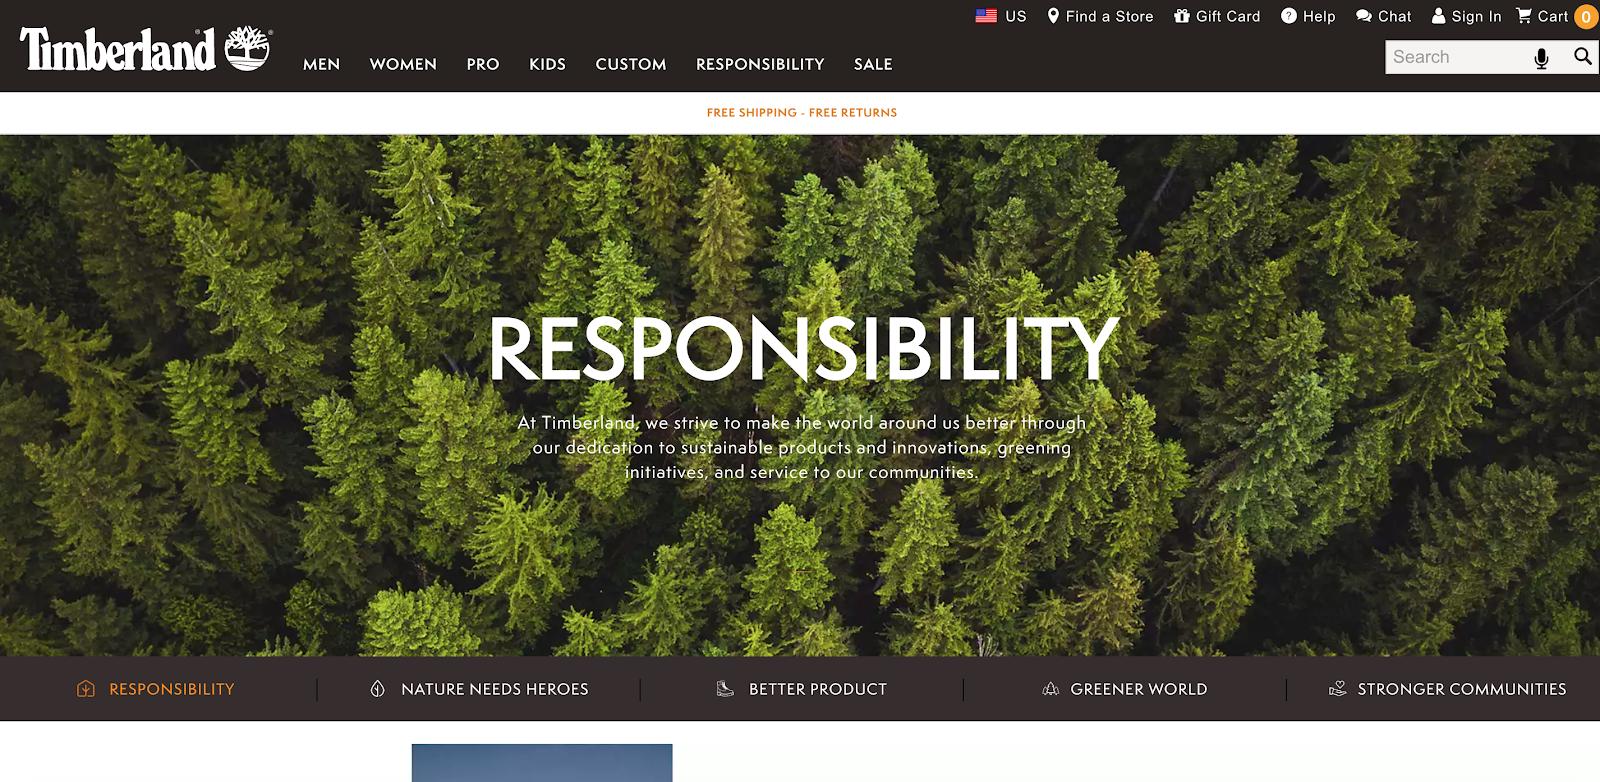 Timberland Ux Design